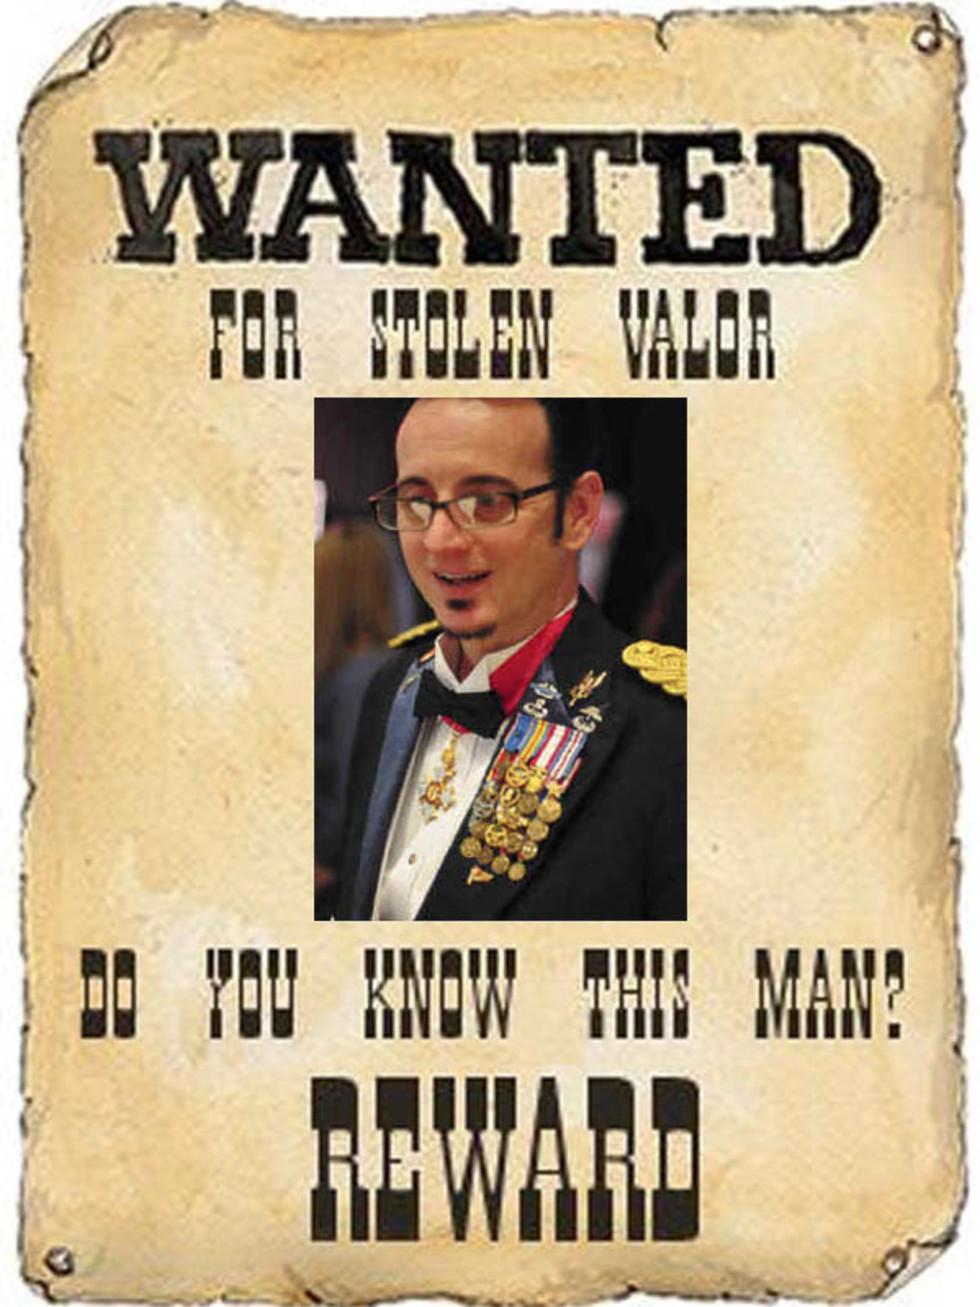 News_Michael Patrick McManus_wanted_poster